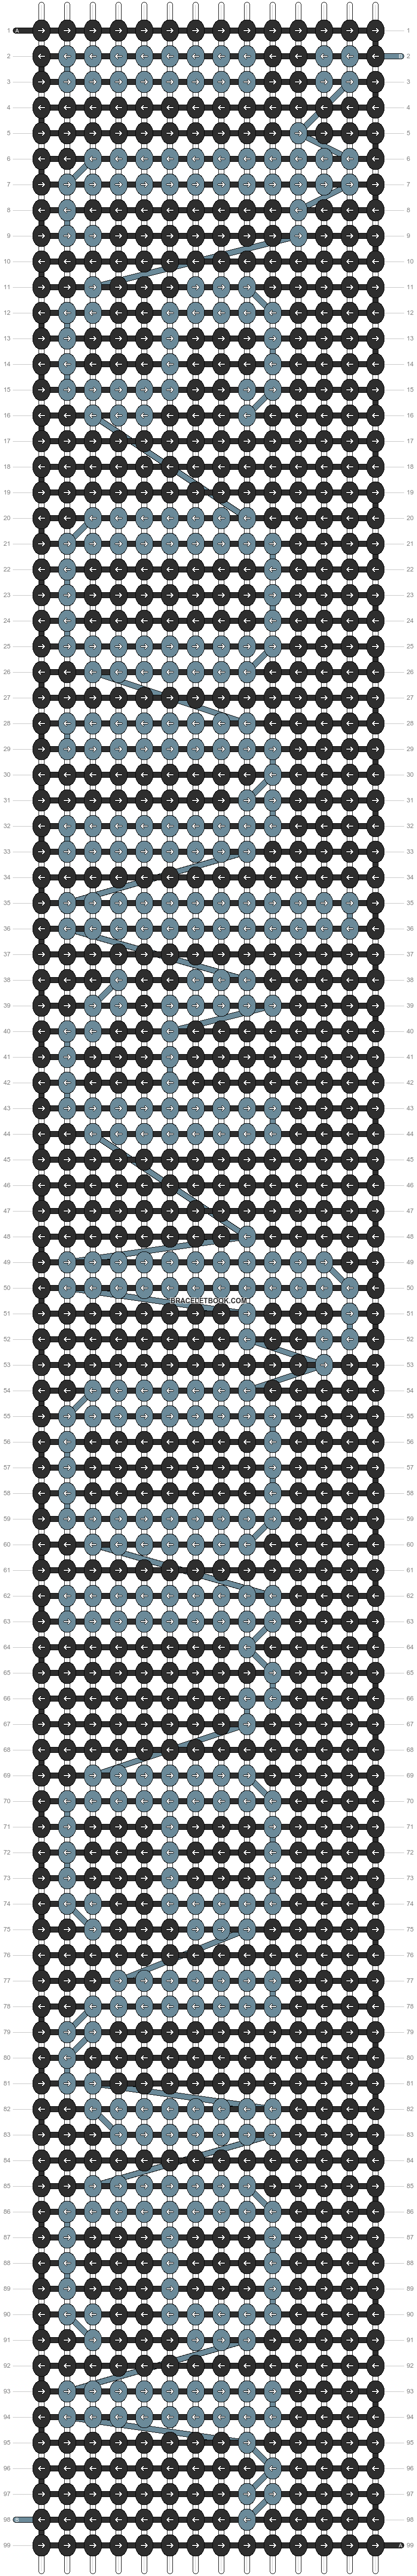 Alpha pattern #4355 pattern